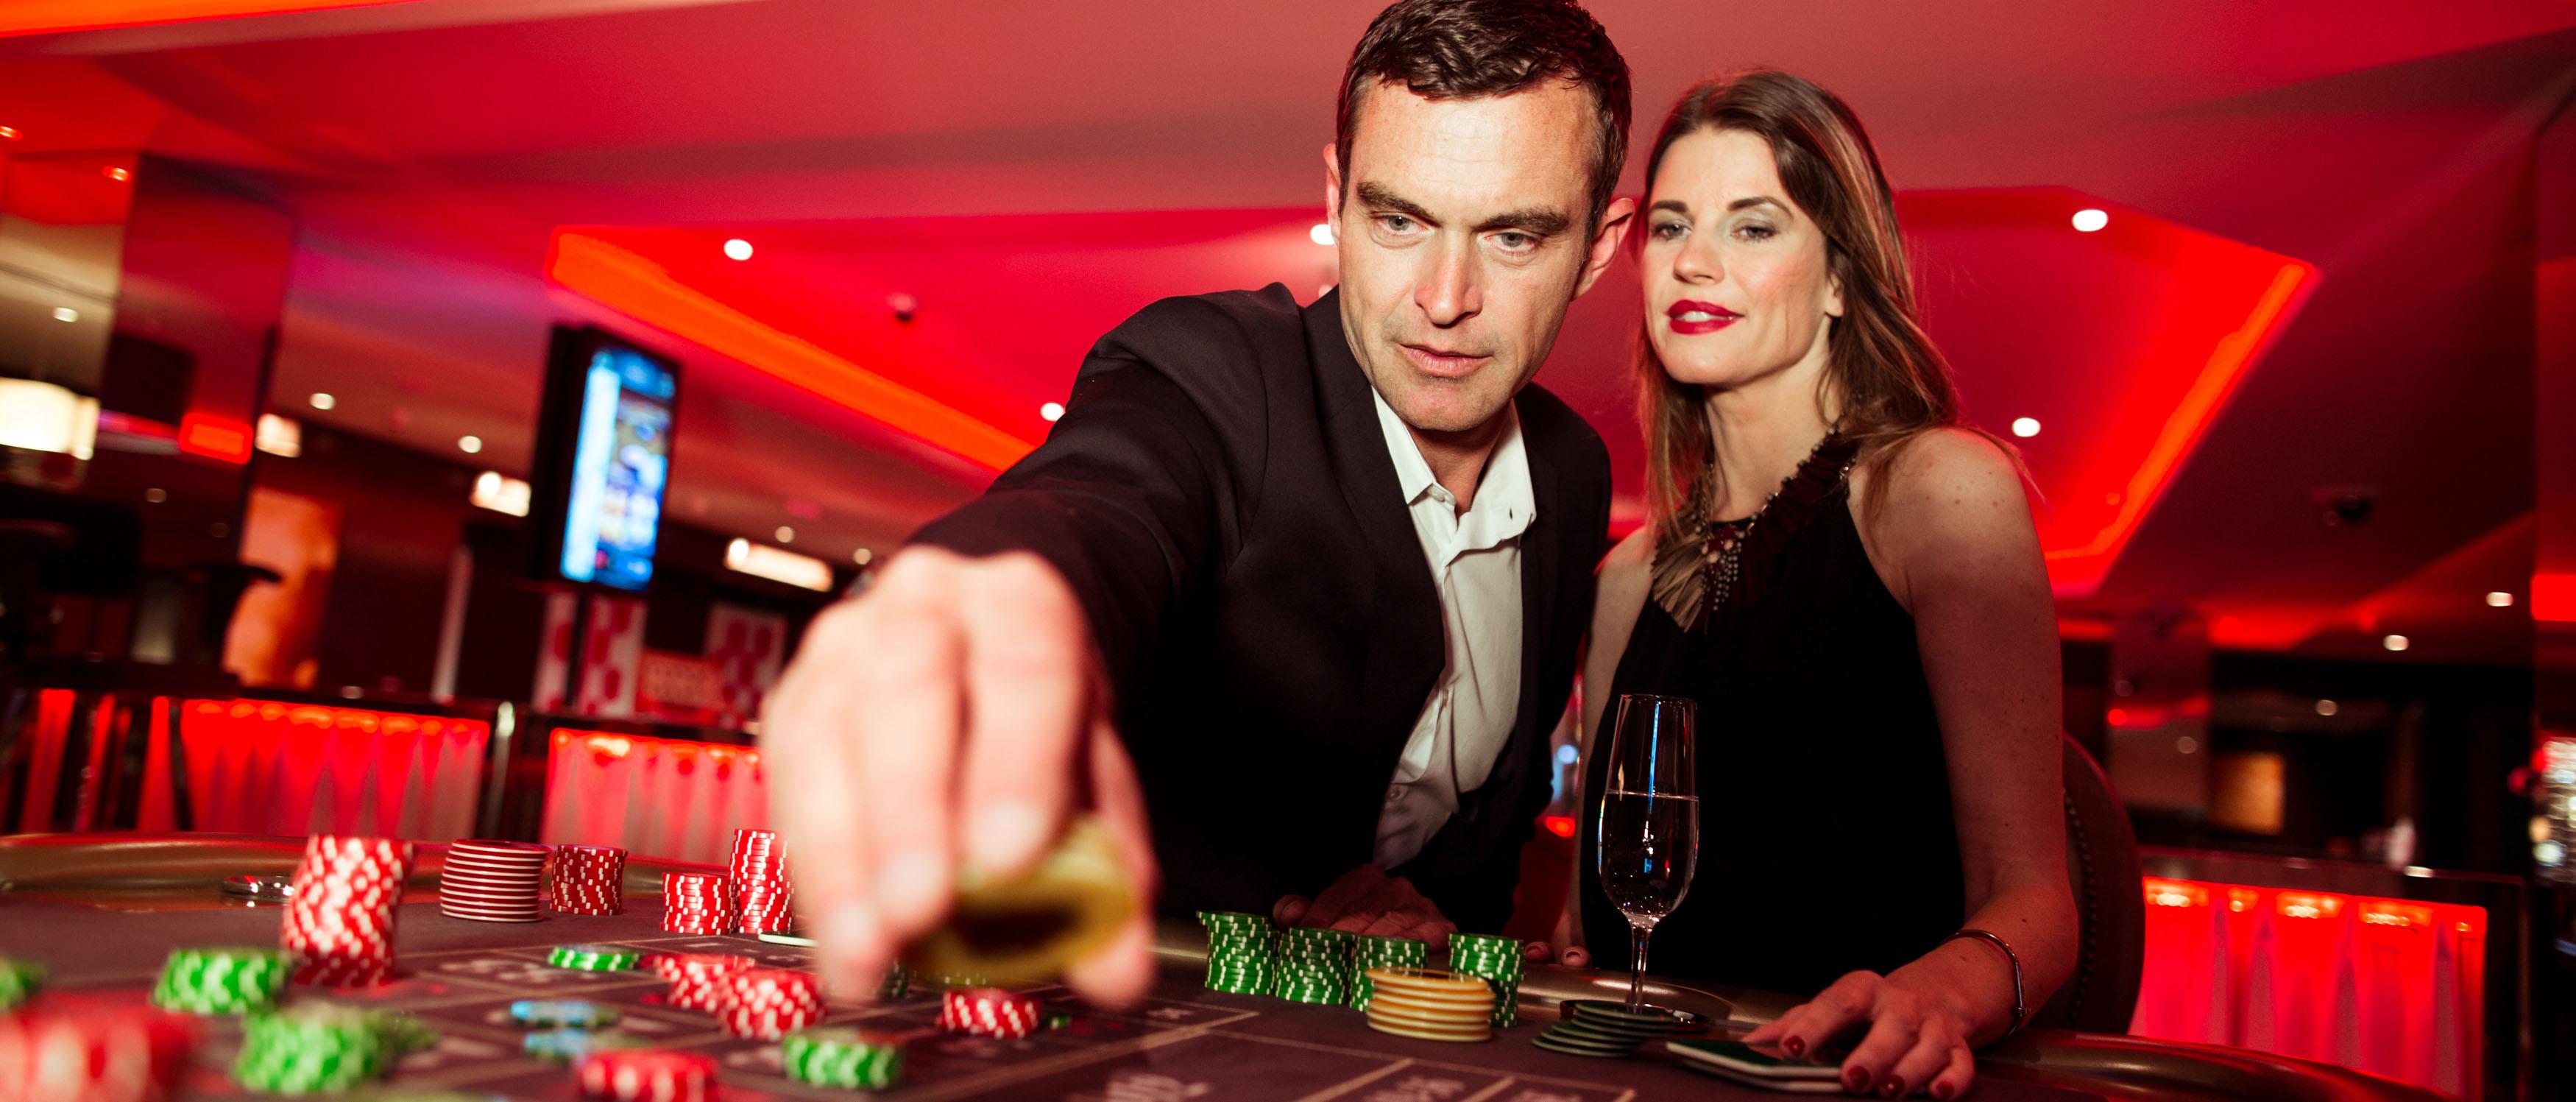 Evian Les Bains Casino Stay 5 Star Luxury Hotel Royal